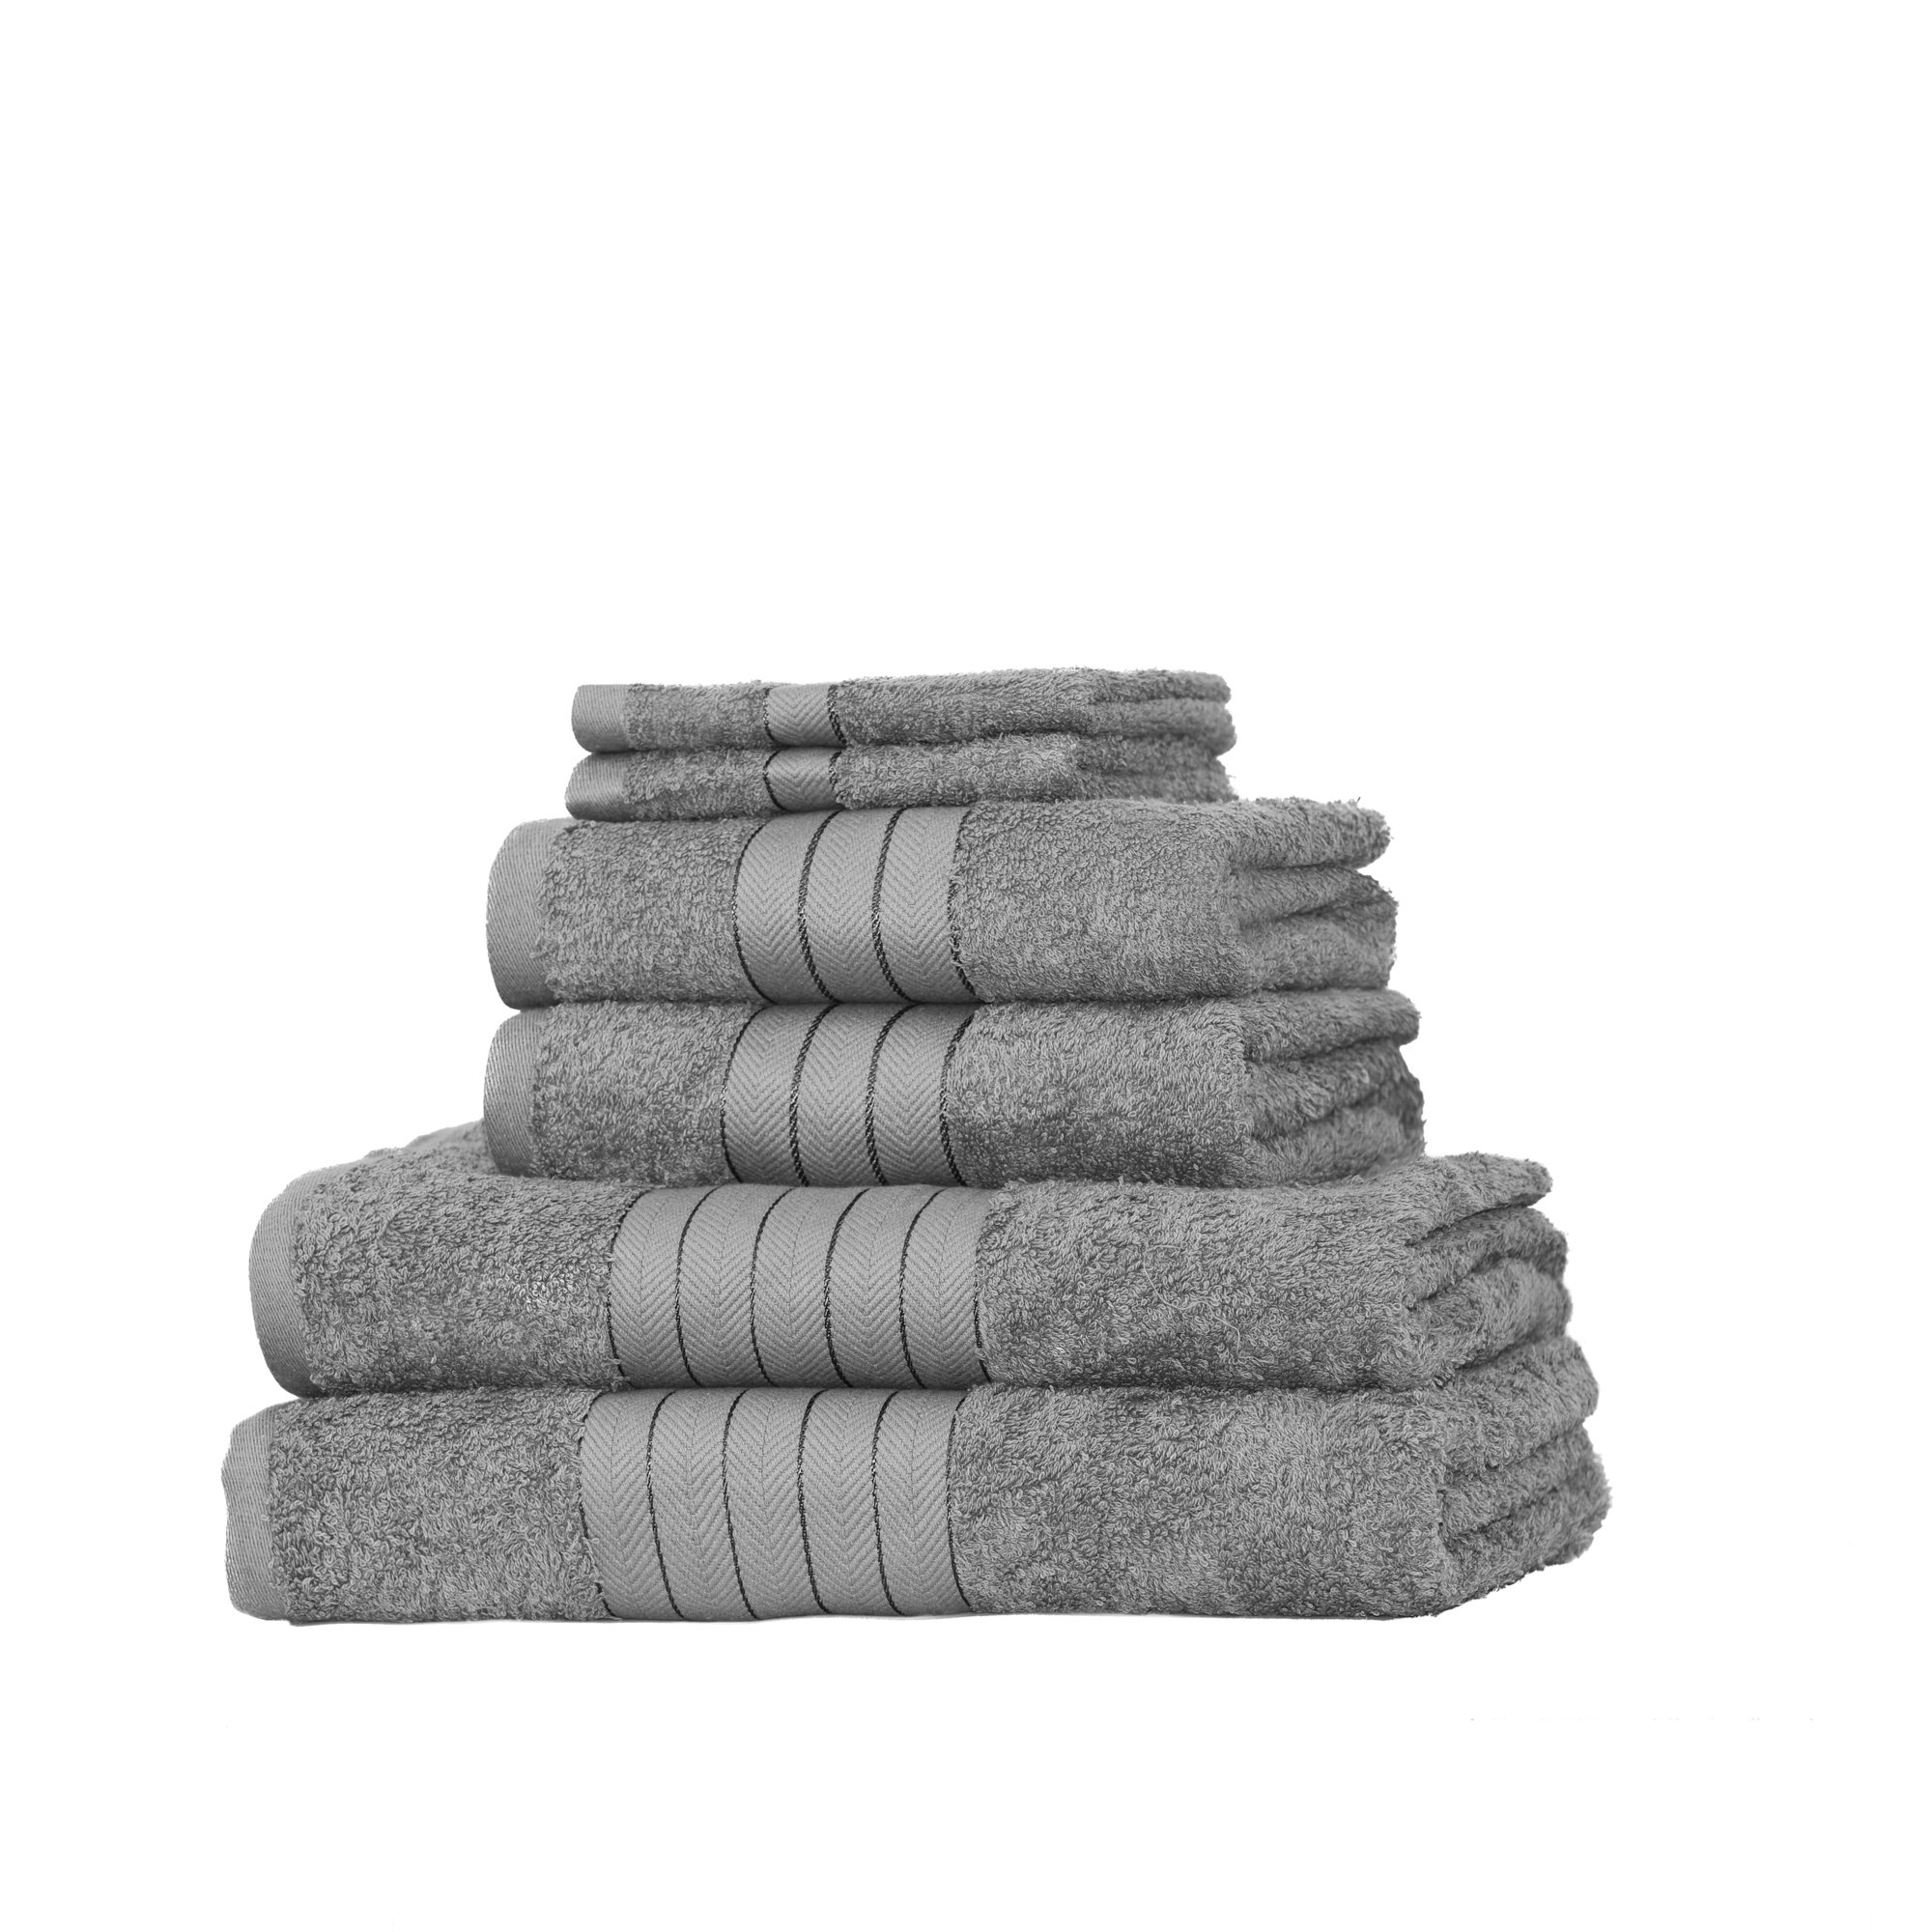 Dreamscene-Luxury-100-Cotton-Face-Hand-Bath-6-Piece-Bathroom-Towel-Bale-Set-NEW thumbnail 29